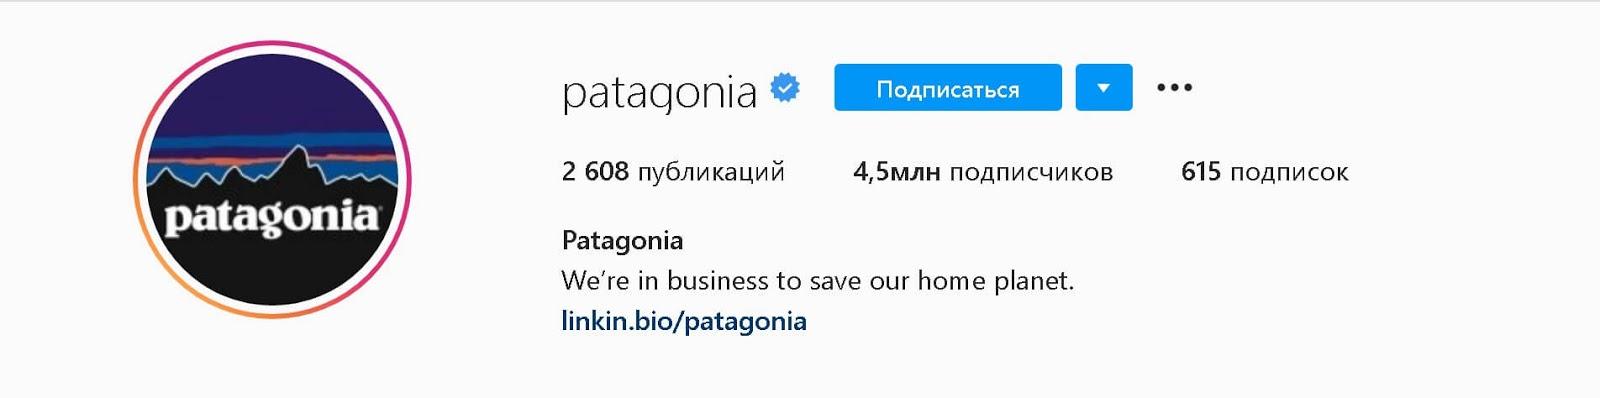 instagram-bios-patagonia